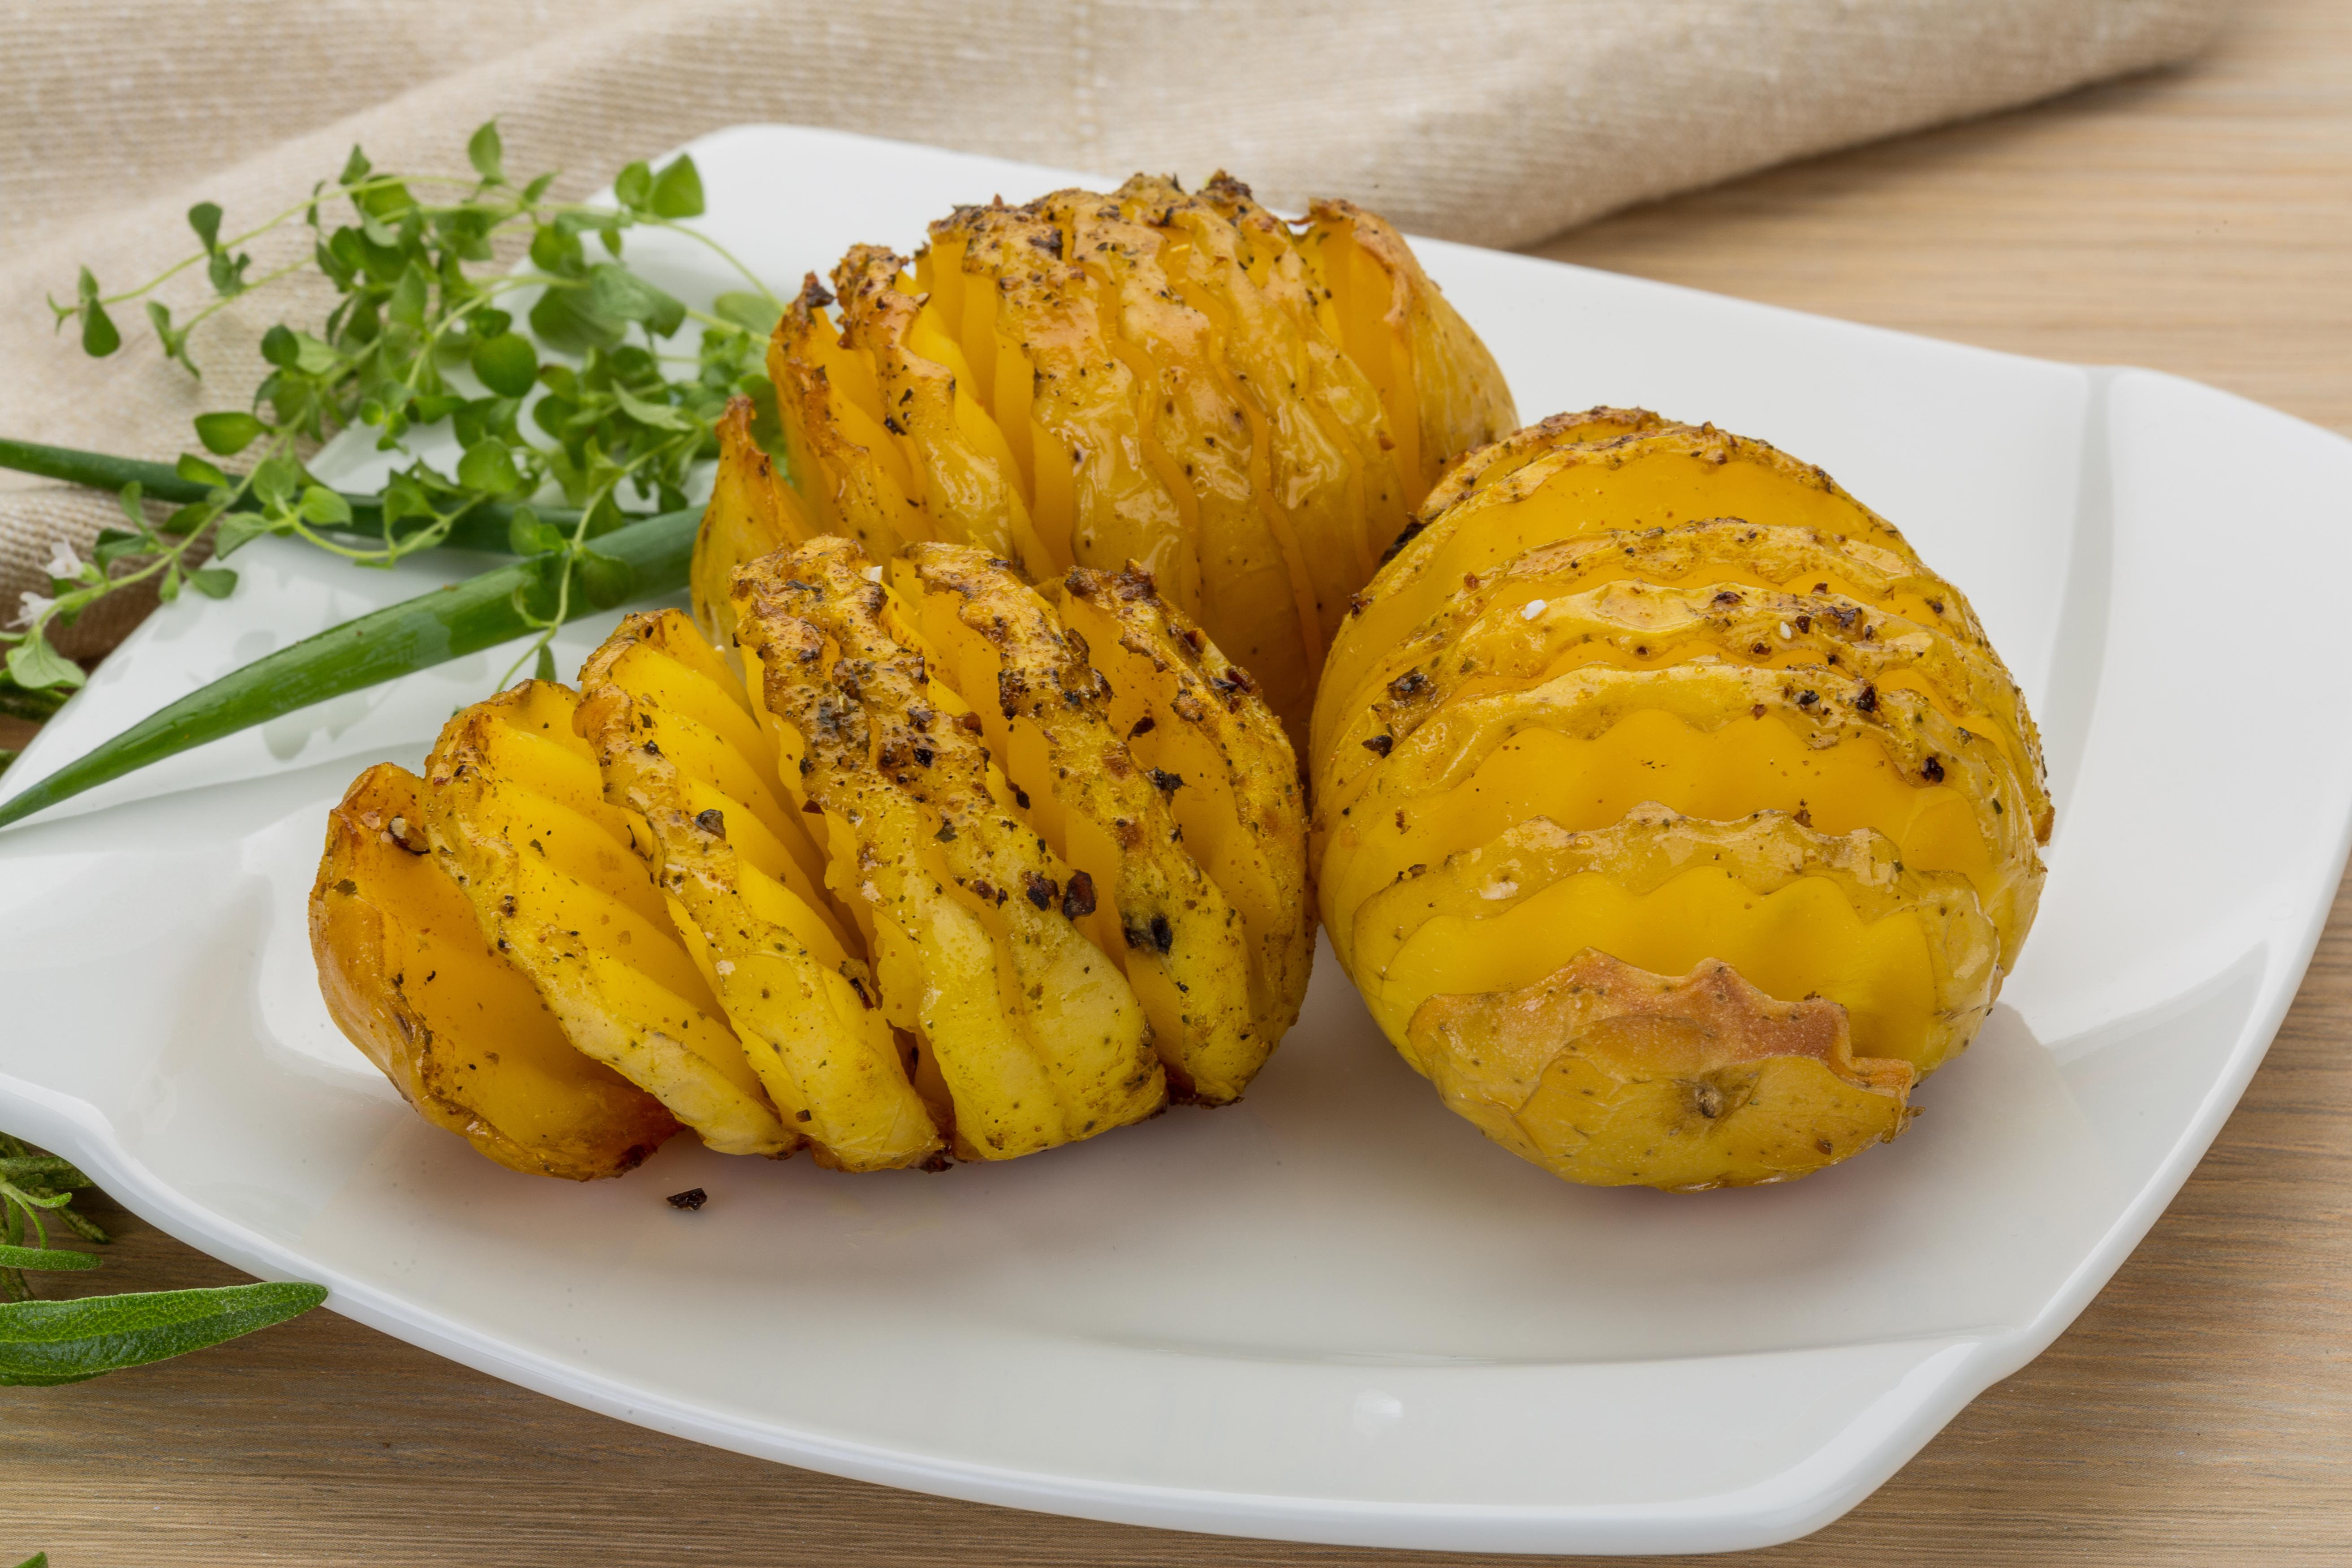 Фотография картошка Еда Тарелка 5250x3500 Картофель Пища тарелке Продукты питания